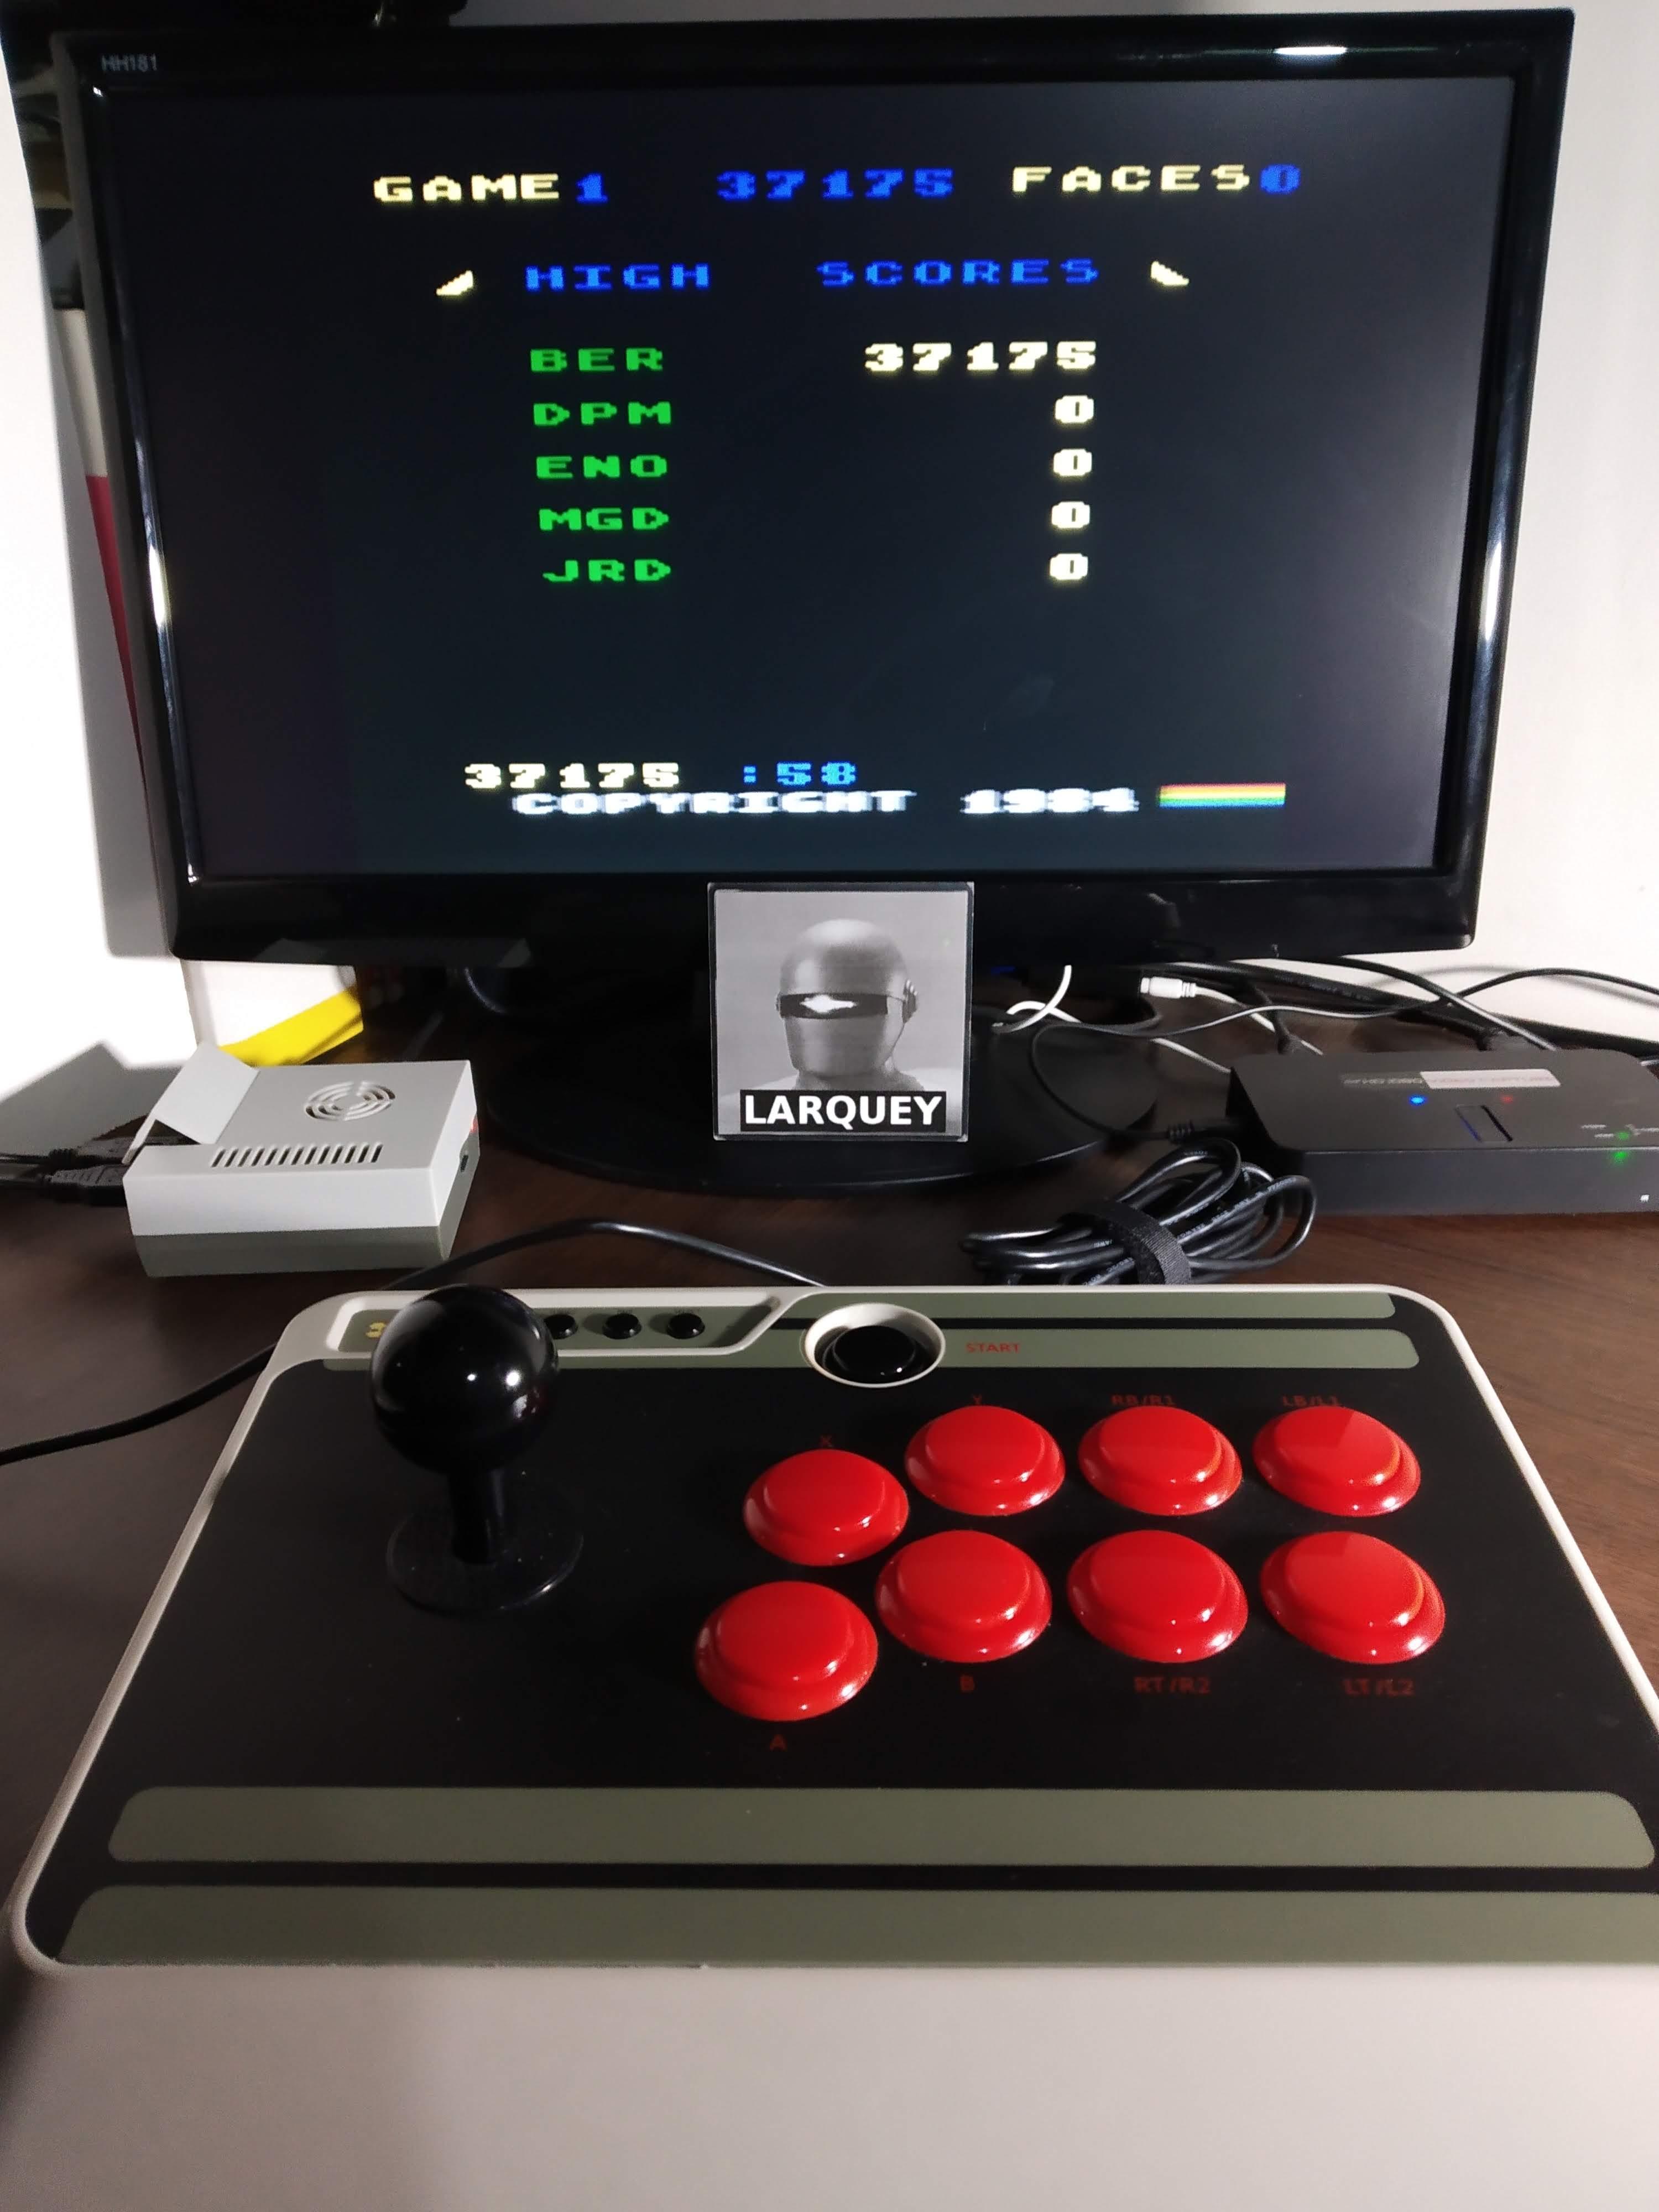 Larquey: Zenji: Game 1 (Atari 5200 Emulated) 37,175 points on 2019-11-13 00:29:48